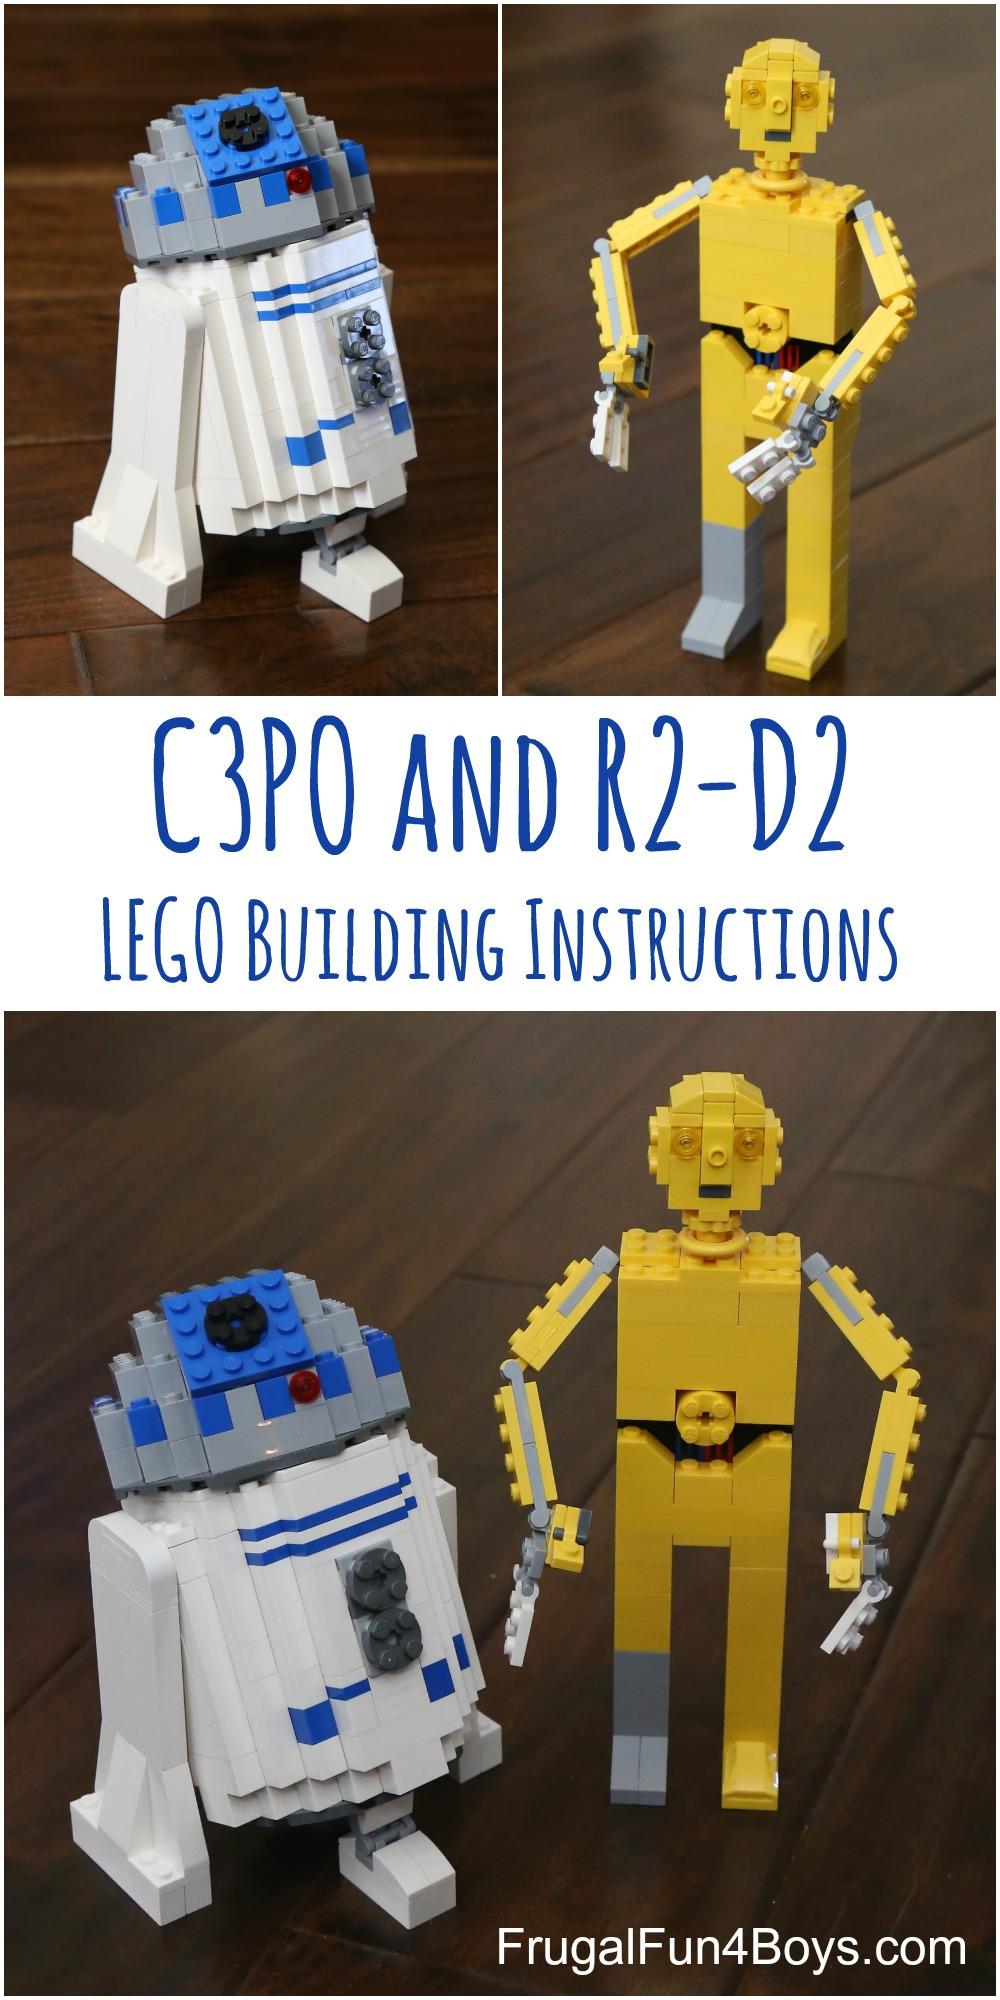 R2d2 And C3po Lego LEGO C3PO and R2-D2 Bu...